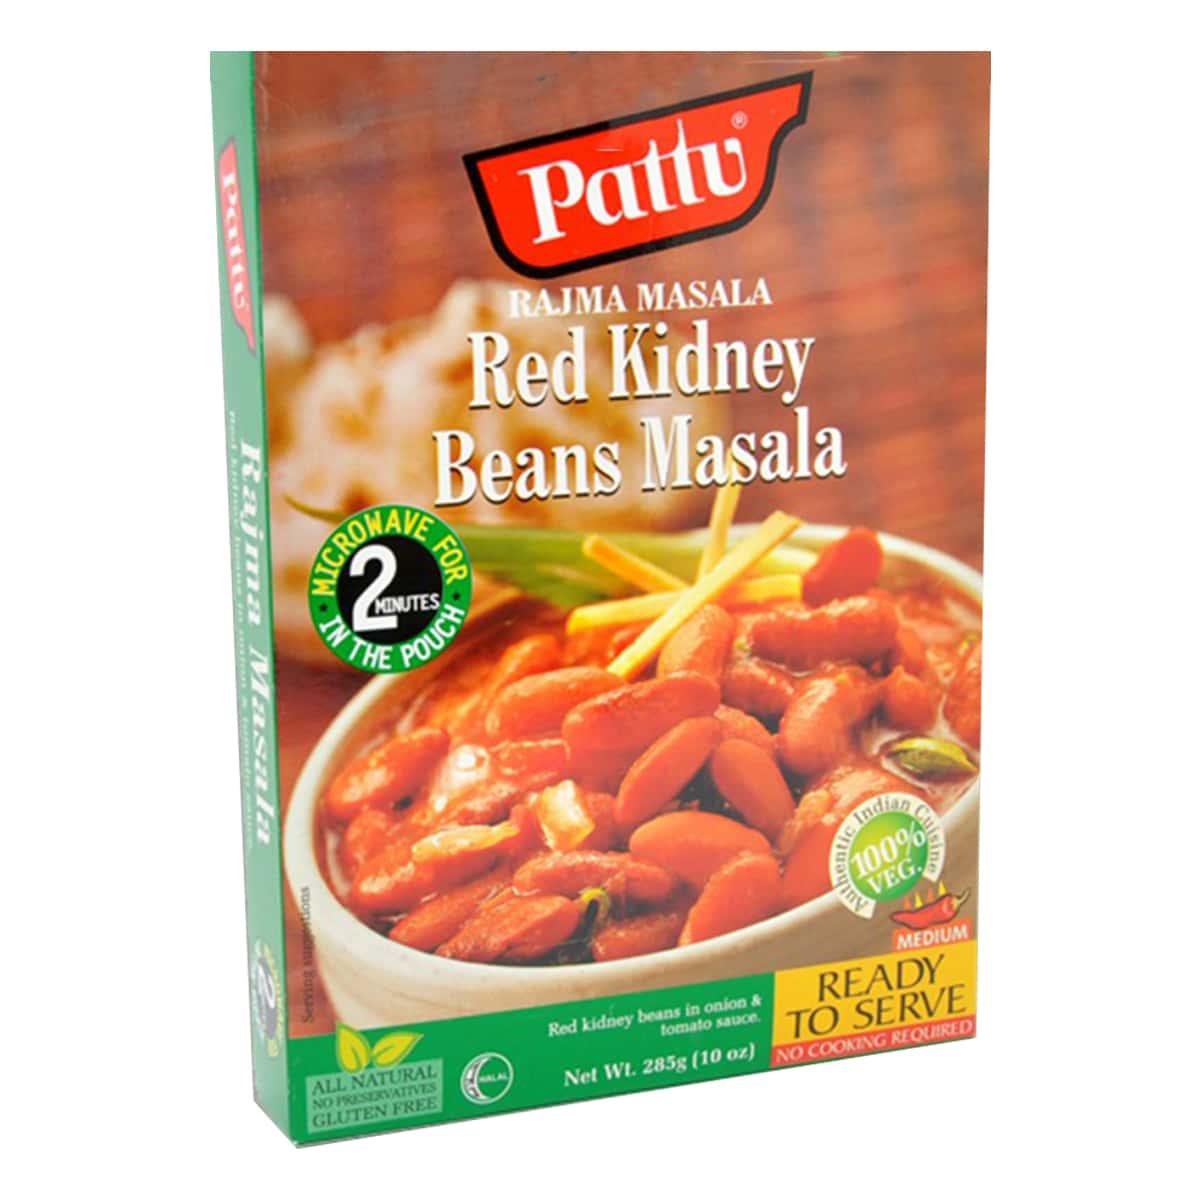 Buy Pattu Rajma Masala (Red Kidney Beans Masala) Ready to Serve - 285 gm